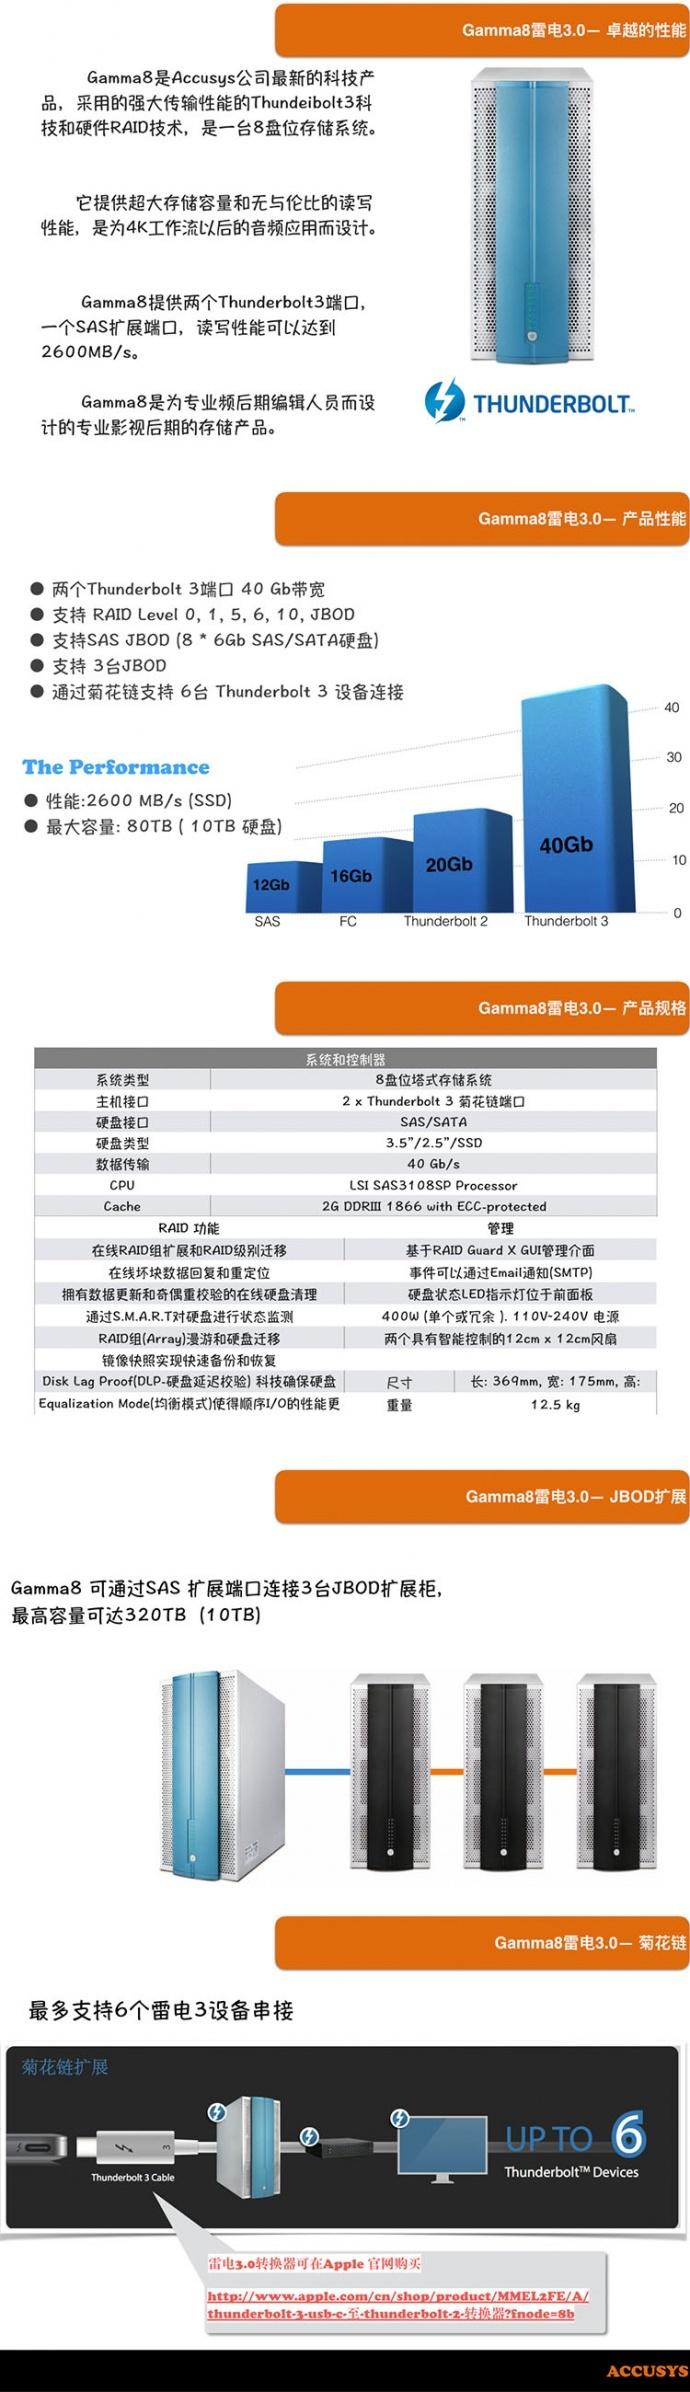 4K存储,【乐呈】Gamma8 雷电3 直连静音存储系统 3年质保